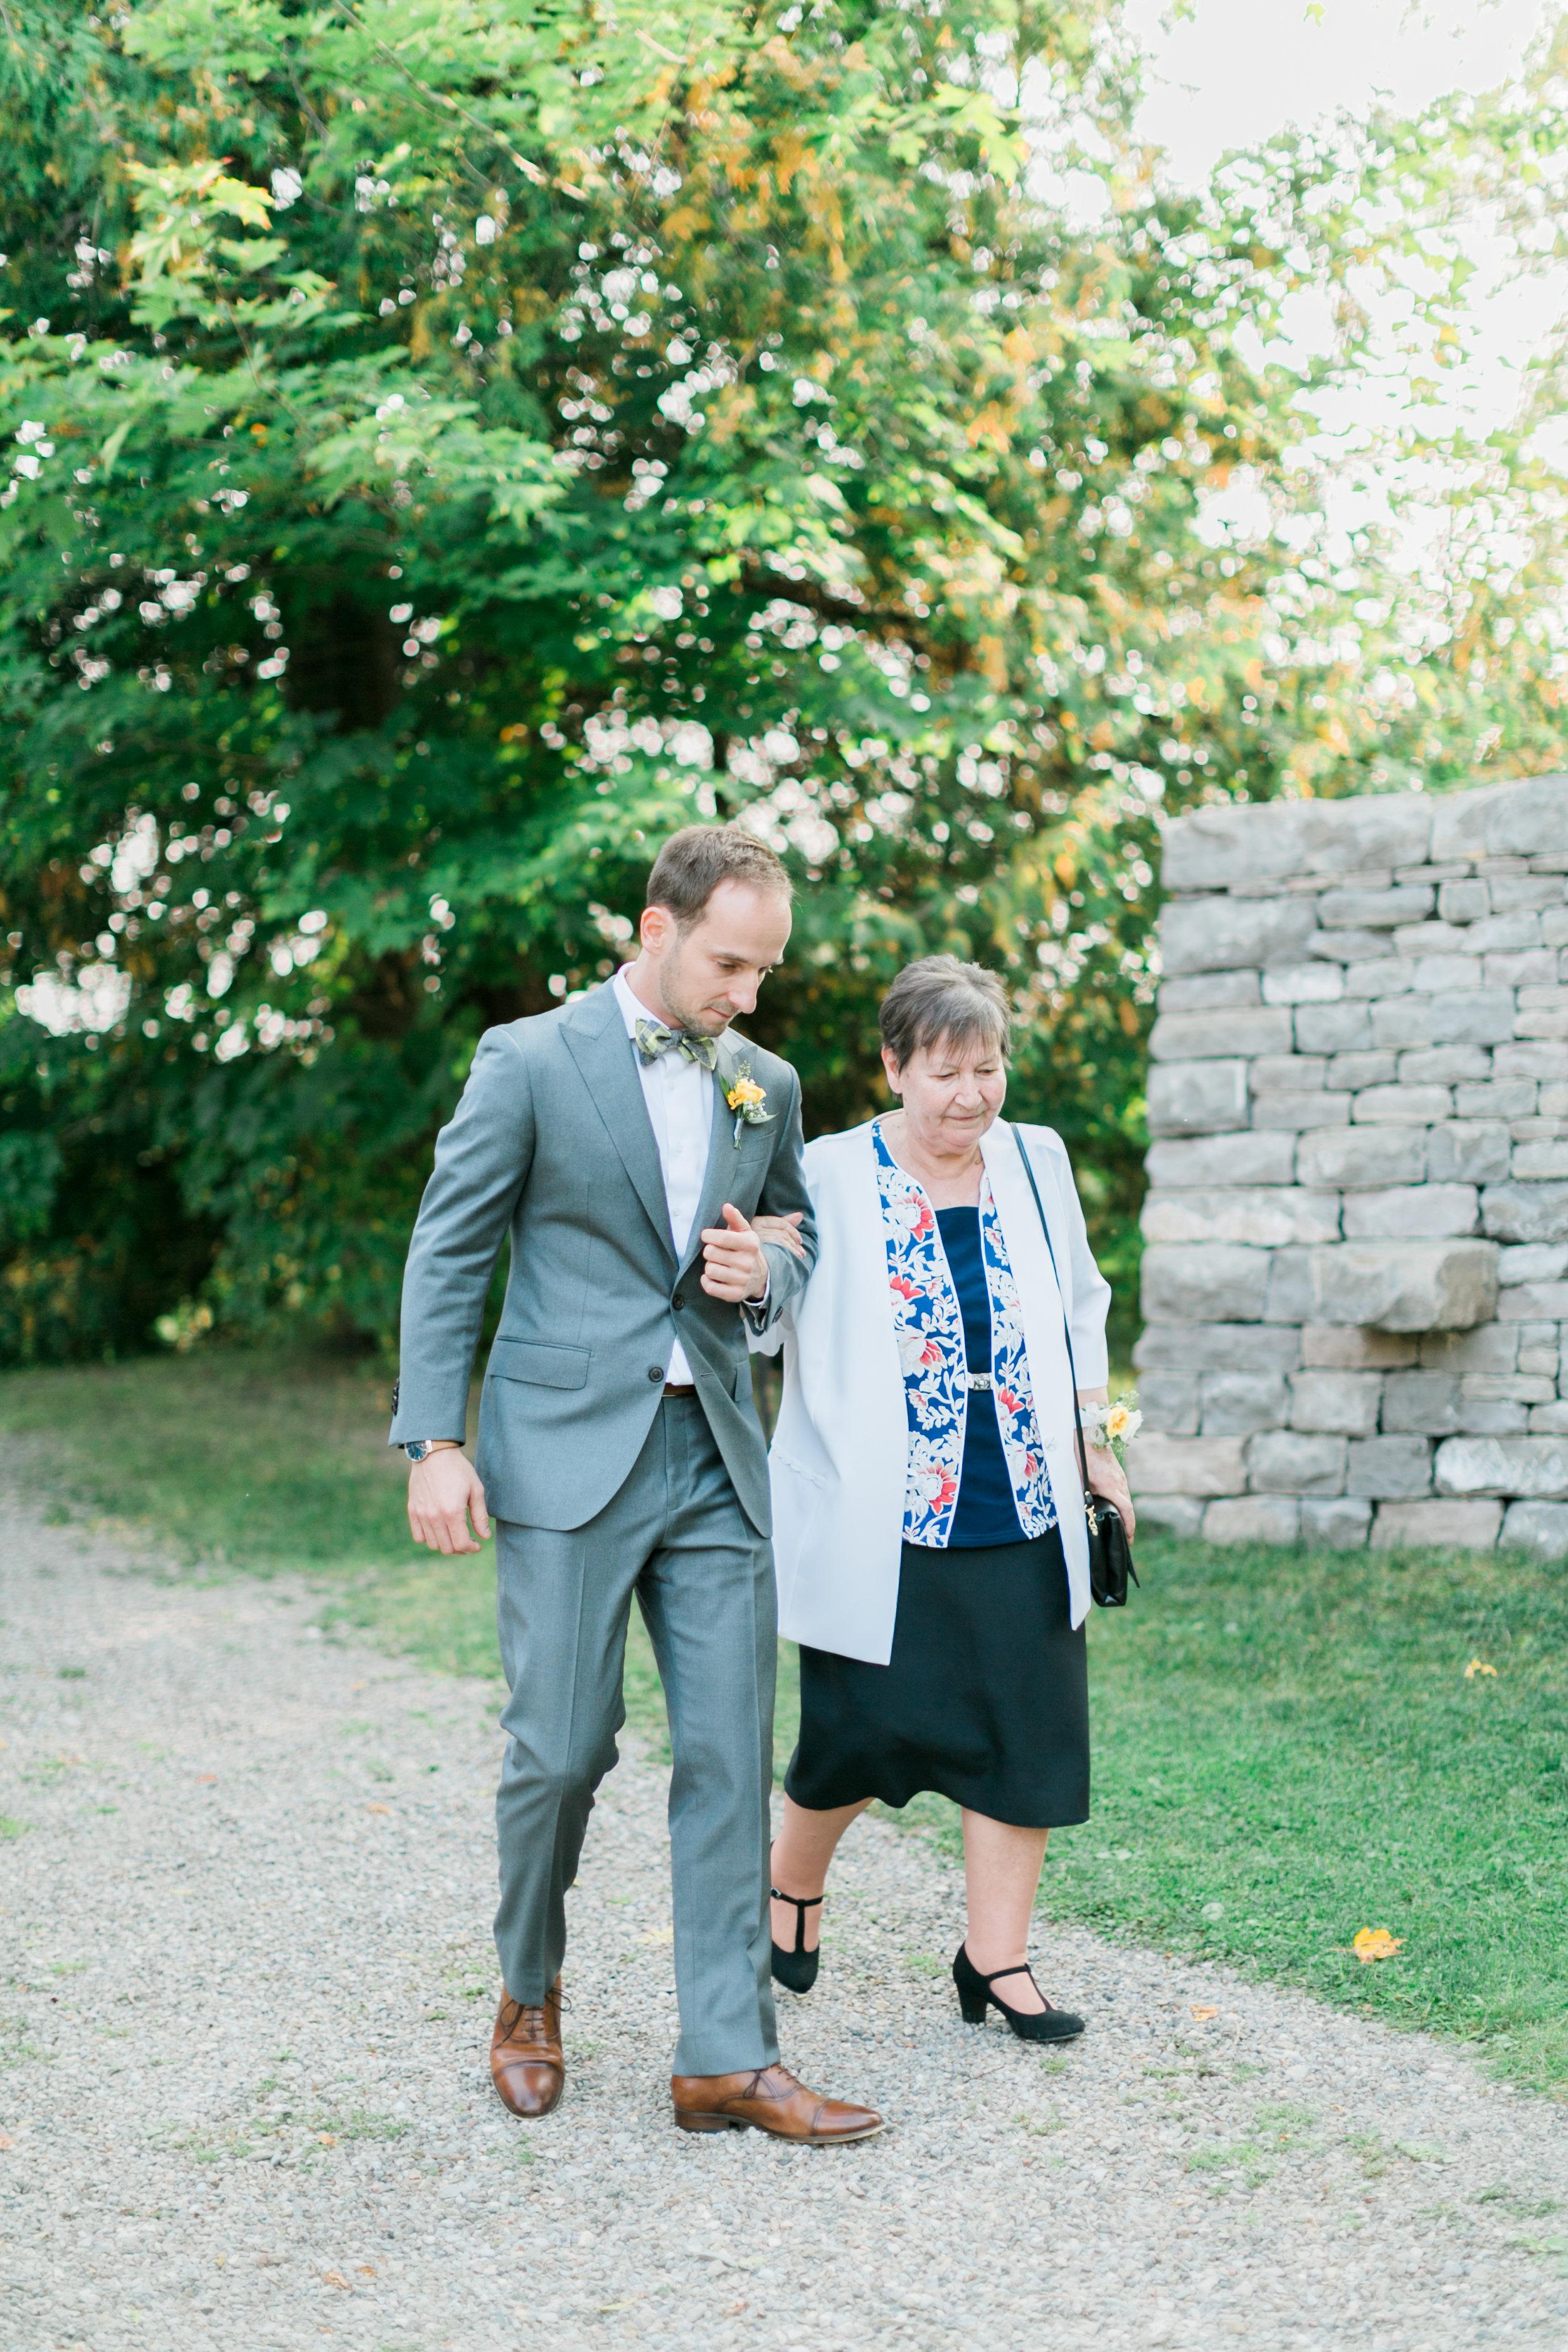 Alton Mills Wedding - Ceremony-25.jpg